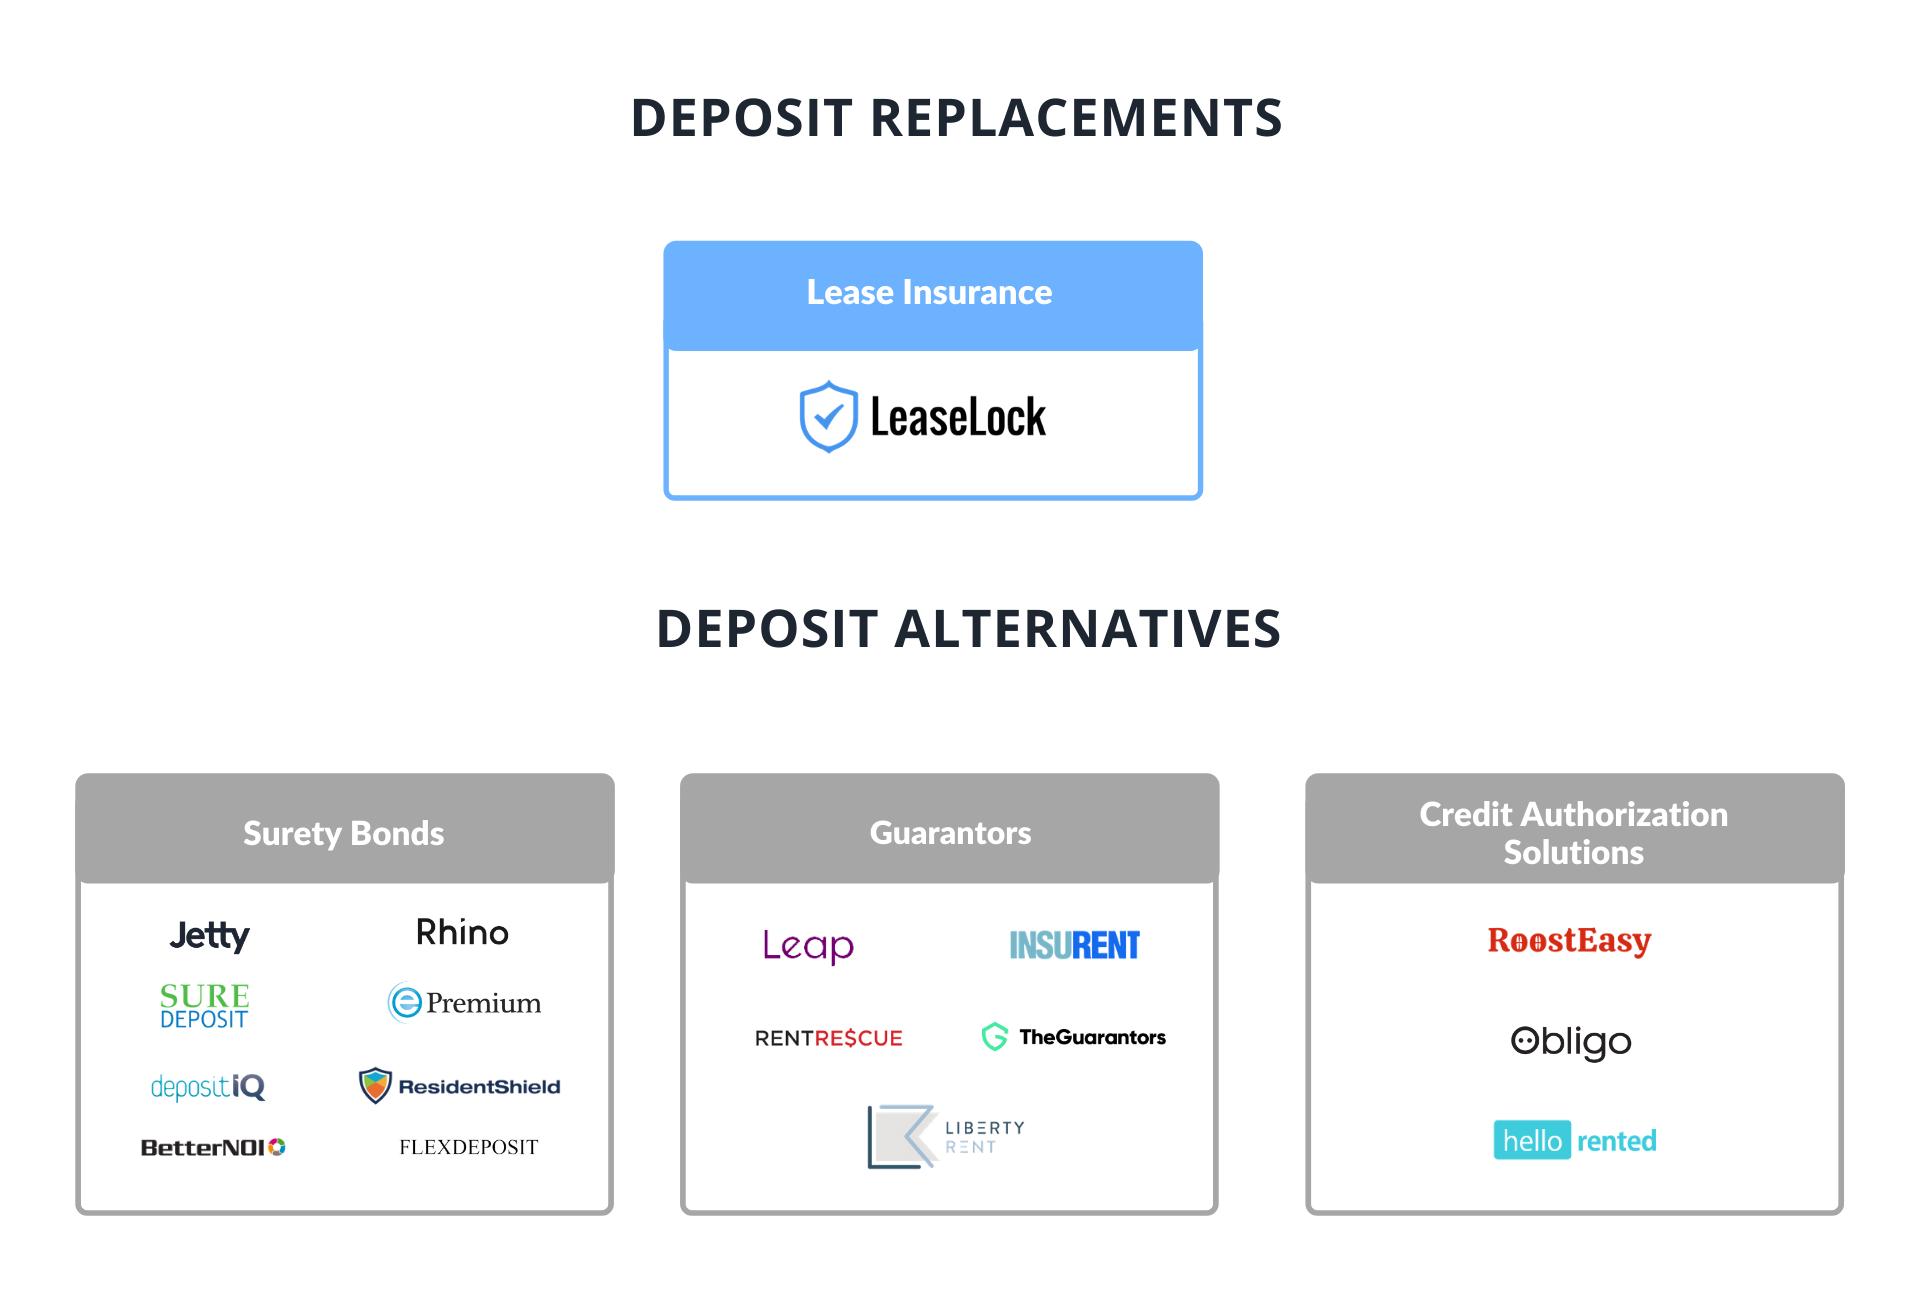 apartment-lease-insurance-security-deposit-alternatives-vs-deposit-replacements-comparison-chart